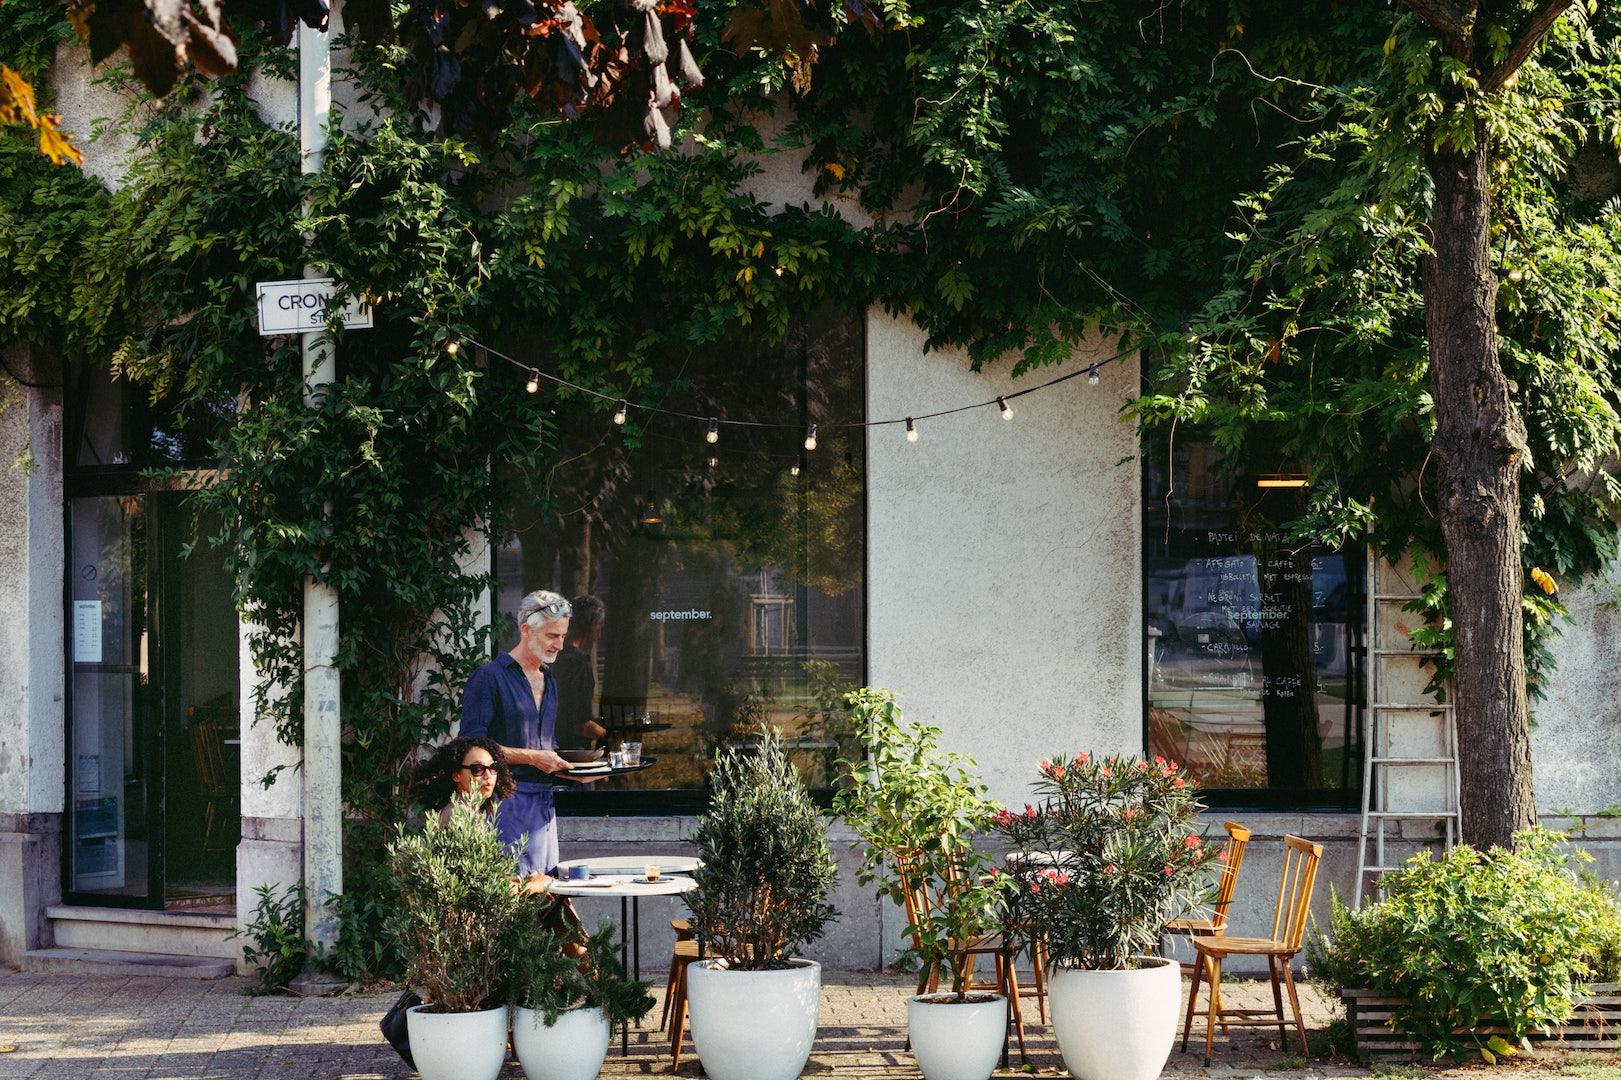 Antwerp - September terrace